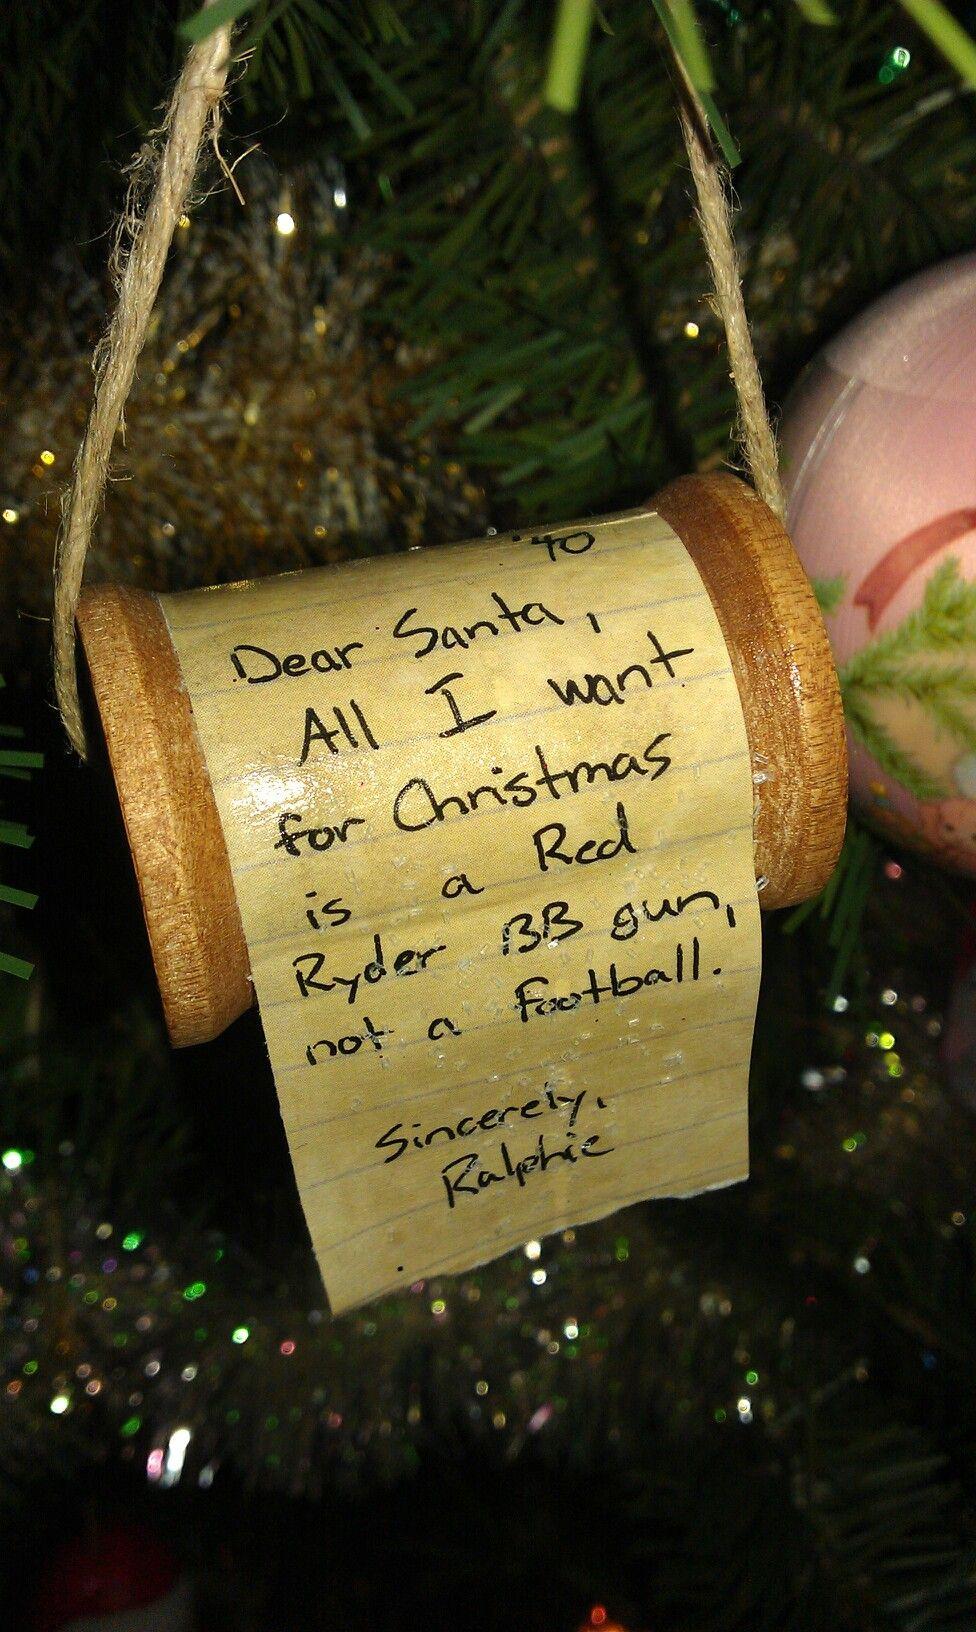 Ralphies letter to santa ornament christmasstory things ive ralphies letter to santa ornament christmasstory spiritdancerdesigns Choice Image